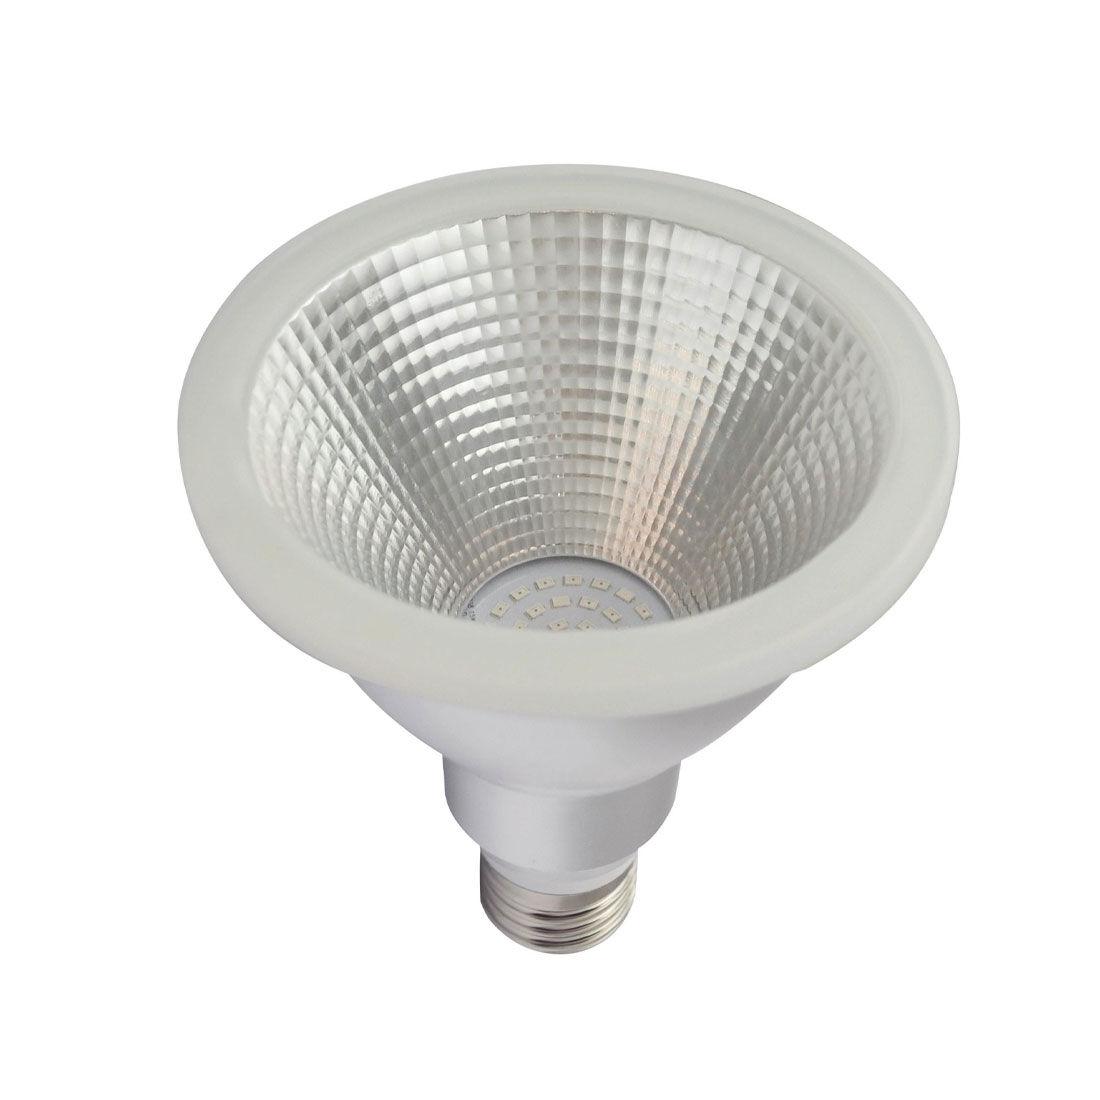 Pr Home Grow Plante Lampe LED 12W E27 IP65 PAR 30